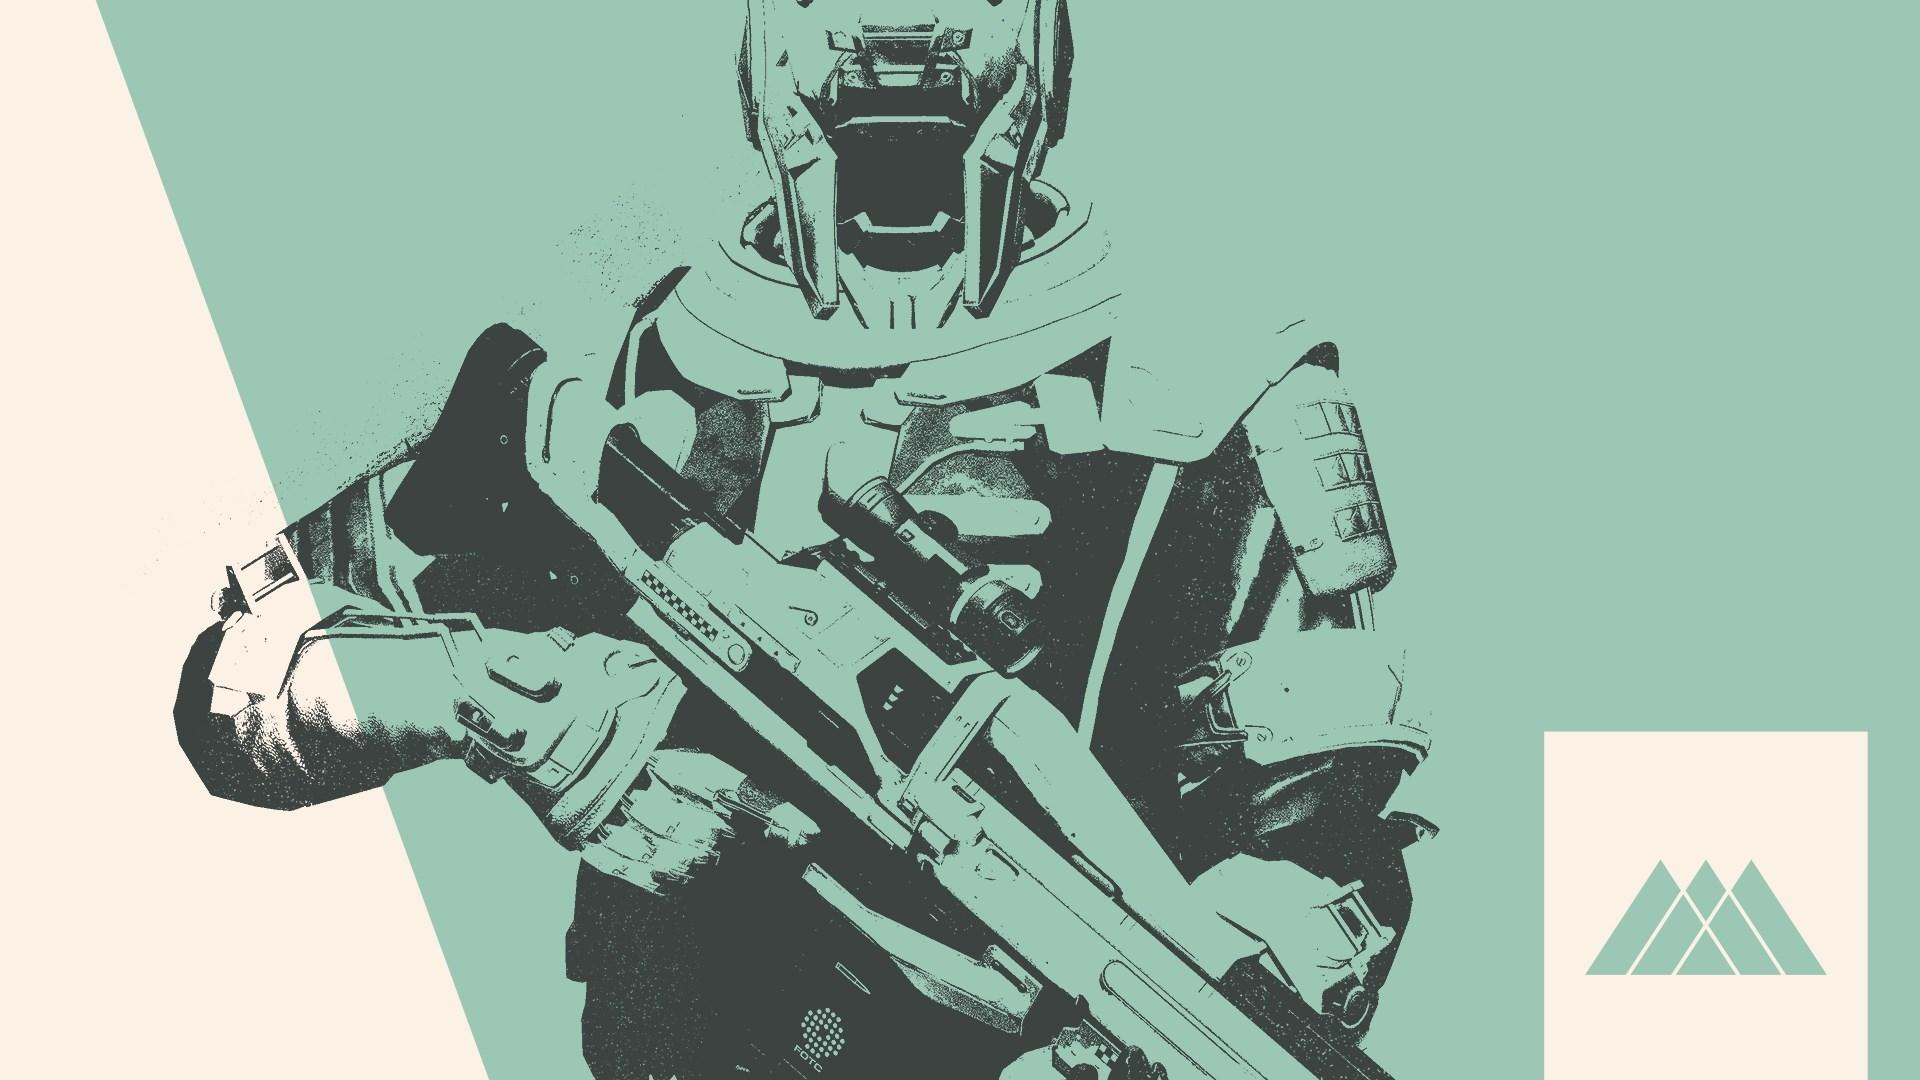 hd-Destiny-by-Preston-Fletcher-wallpaper-wp3806405